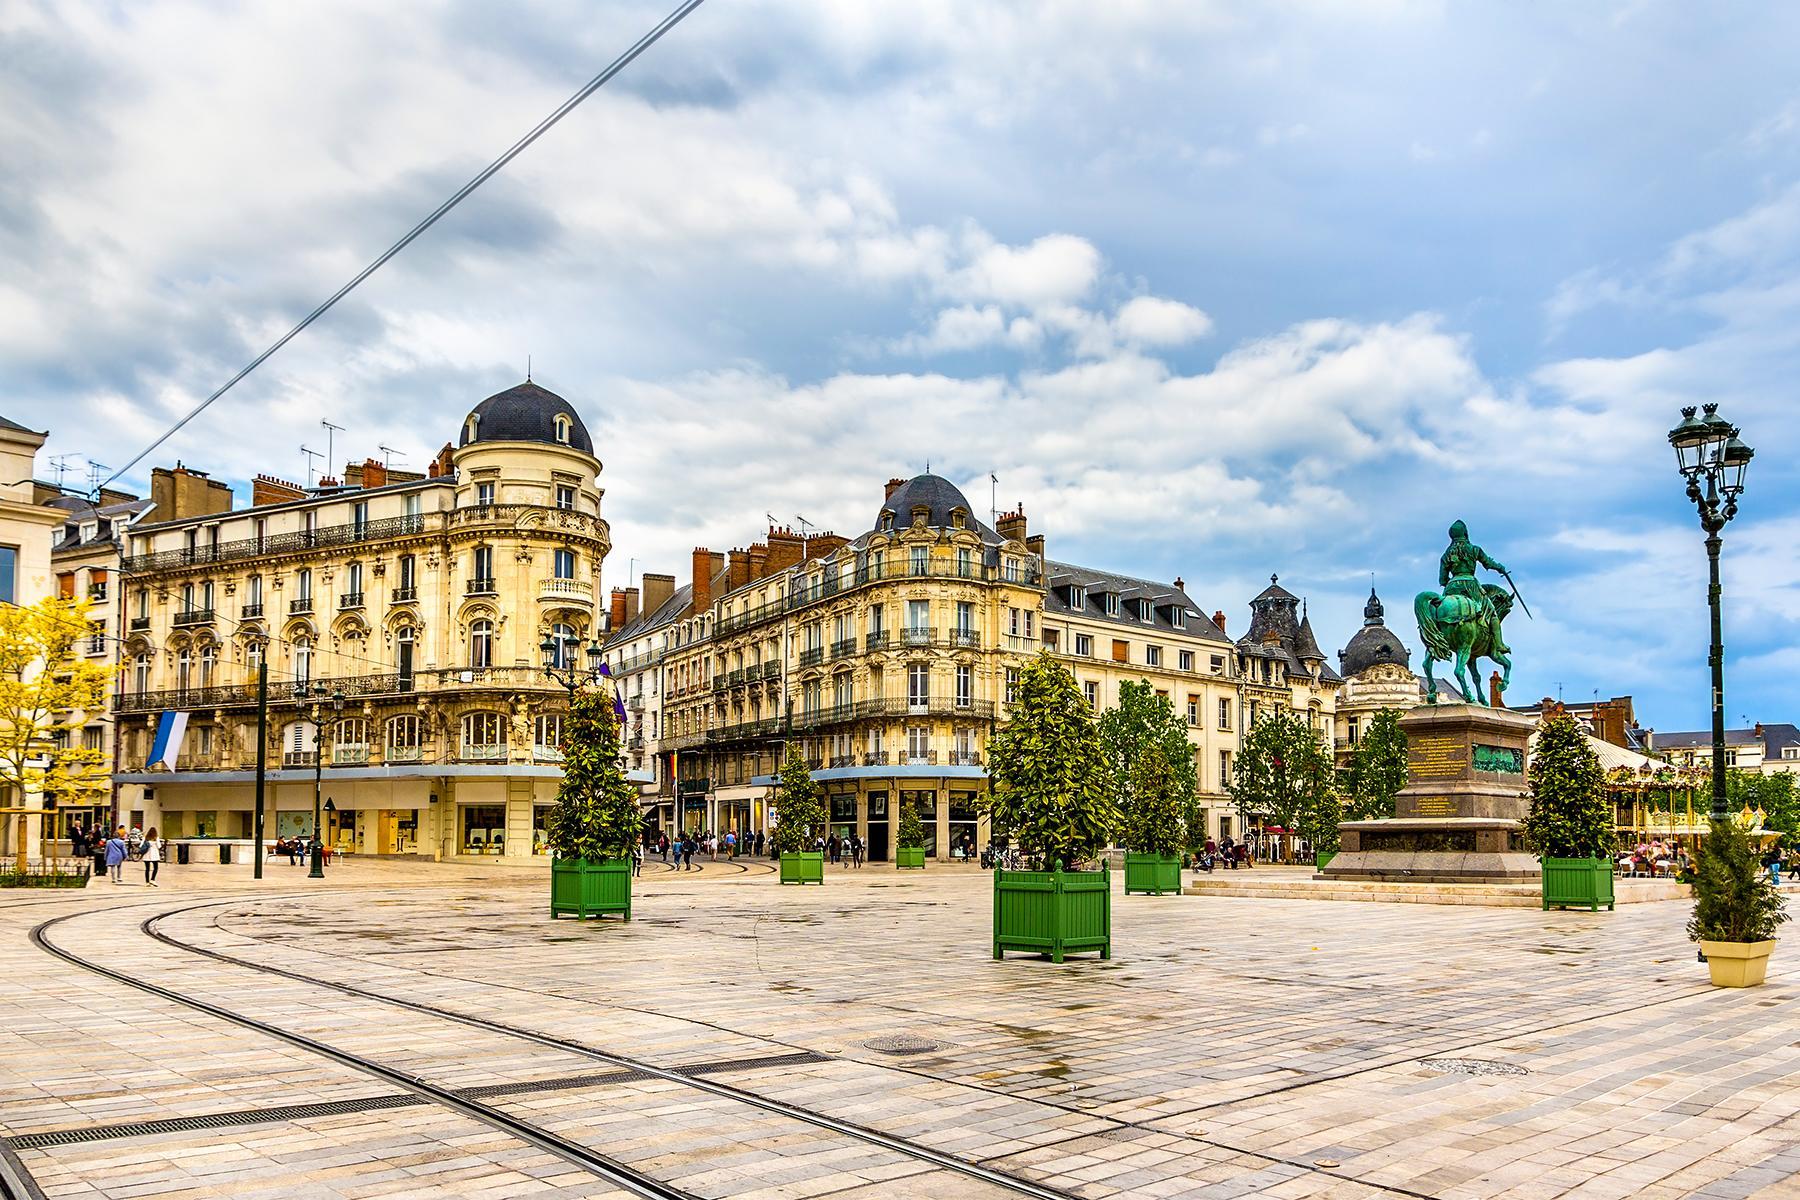 10 Quaint Side Trips to Take on Your Next European Getaway